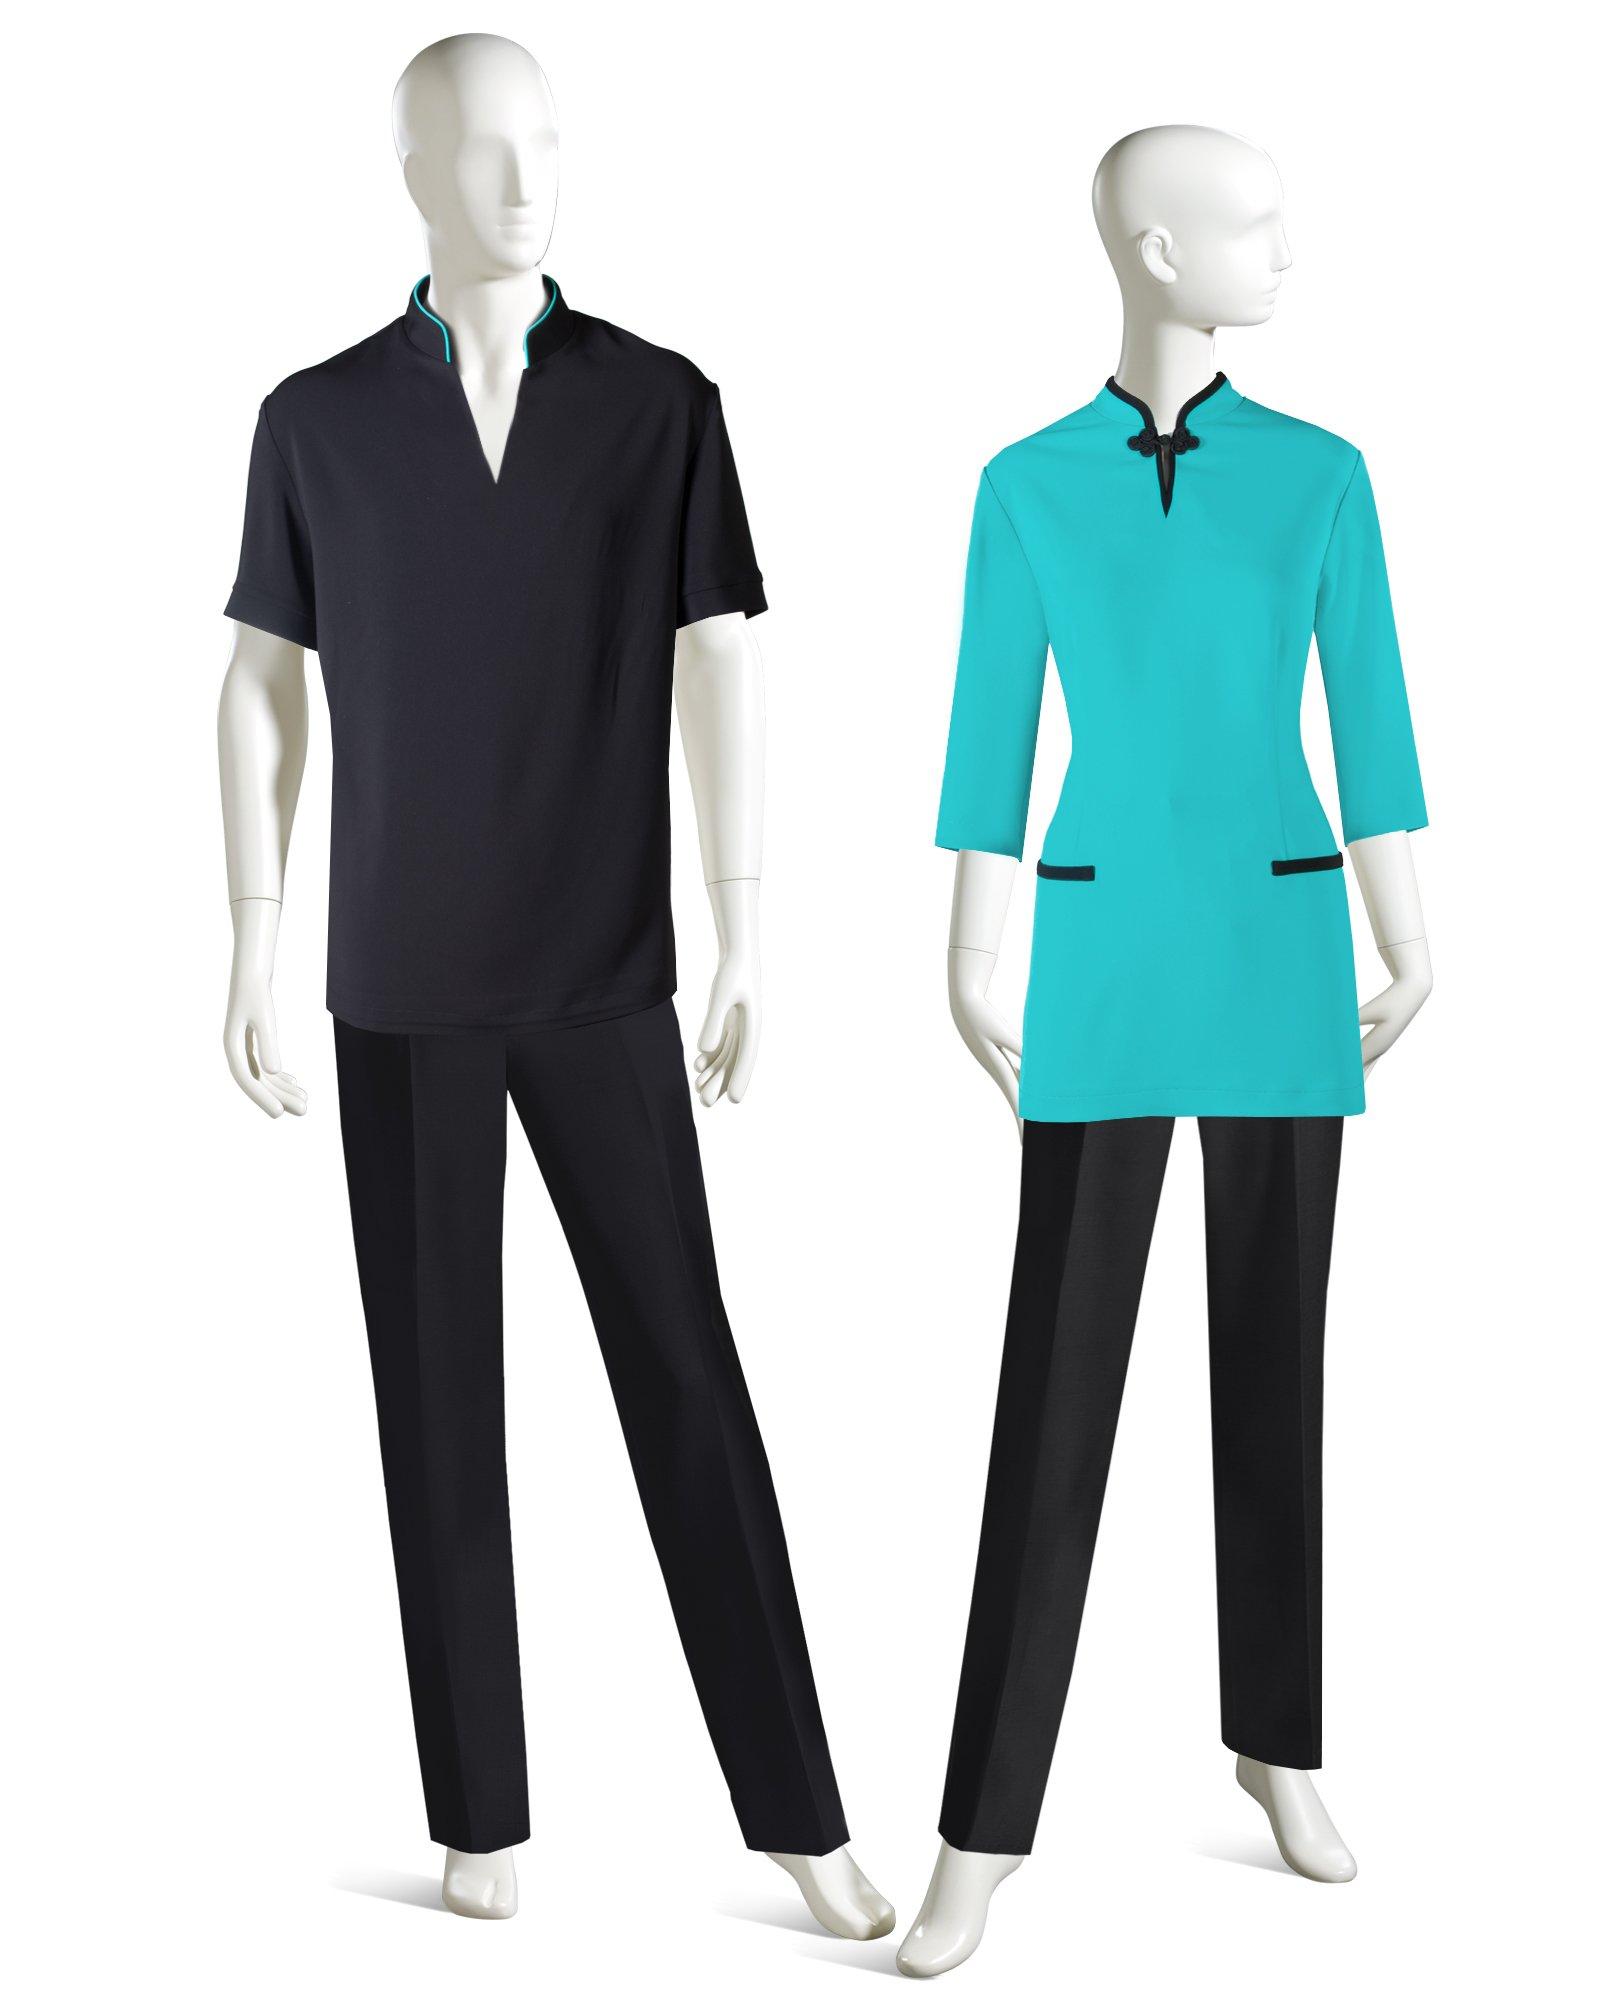 Sp147 for Uniform spa manager